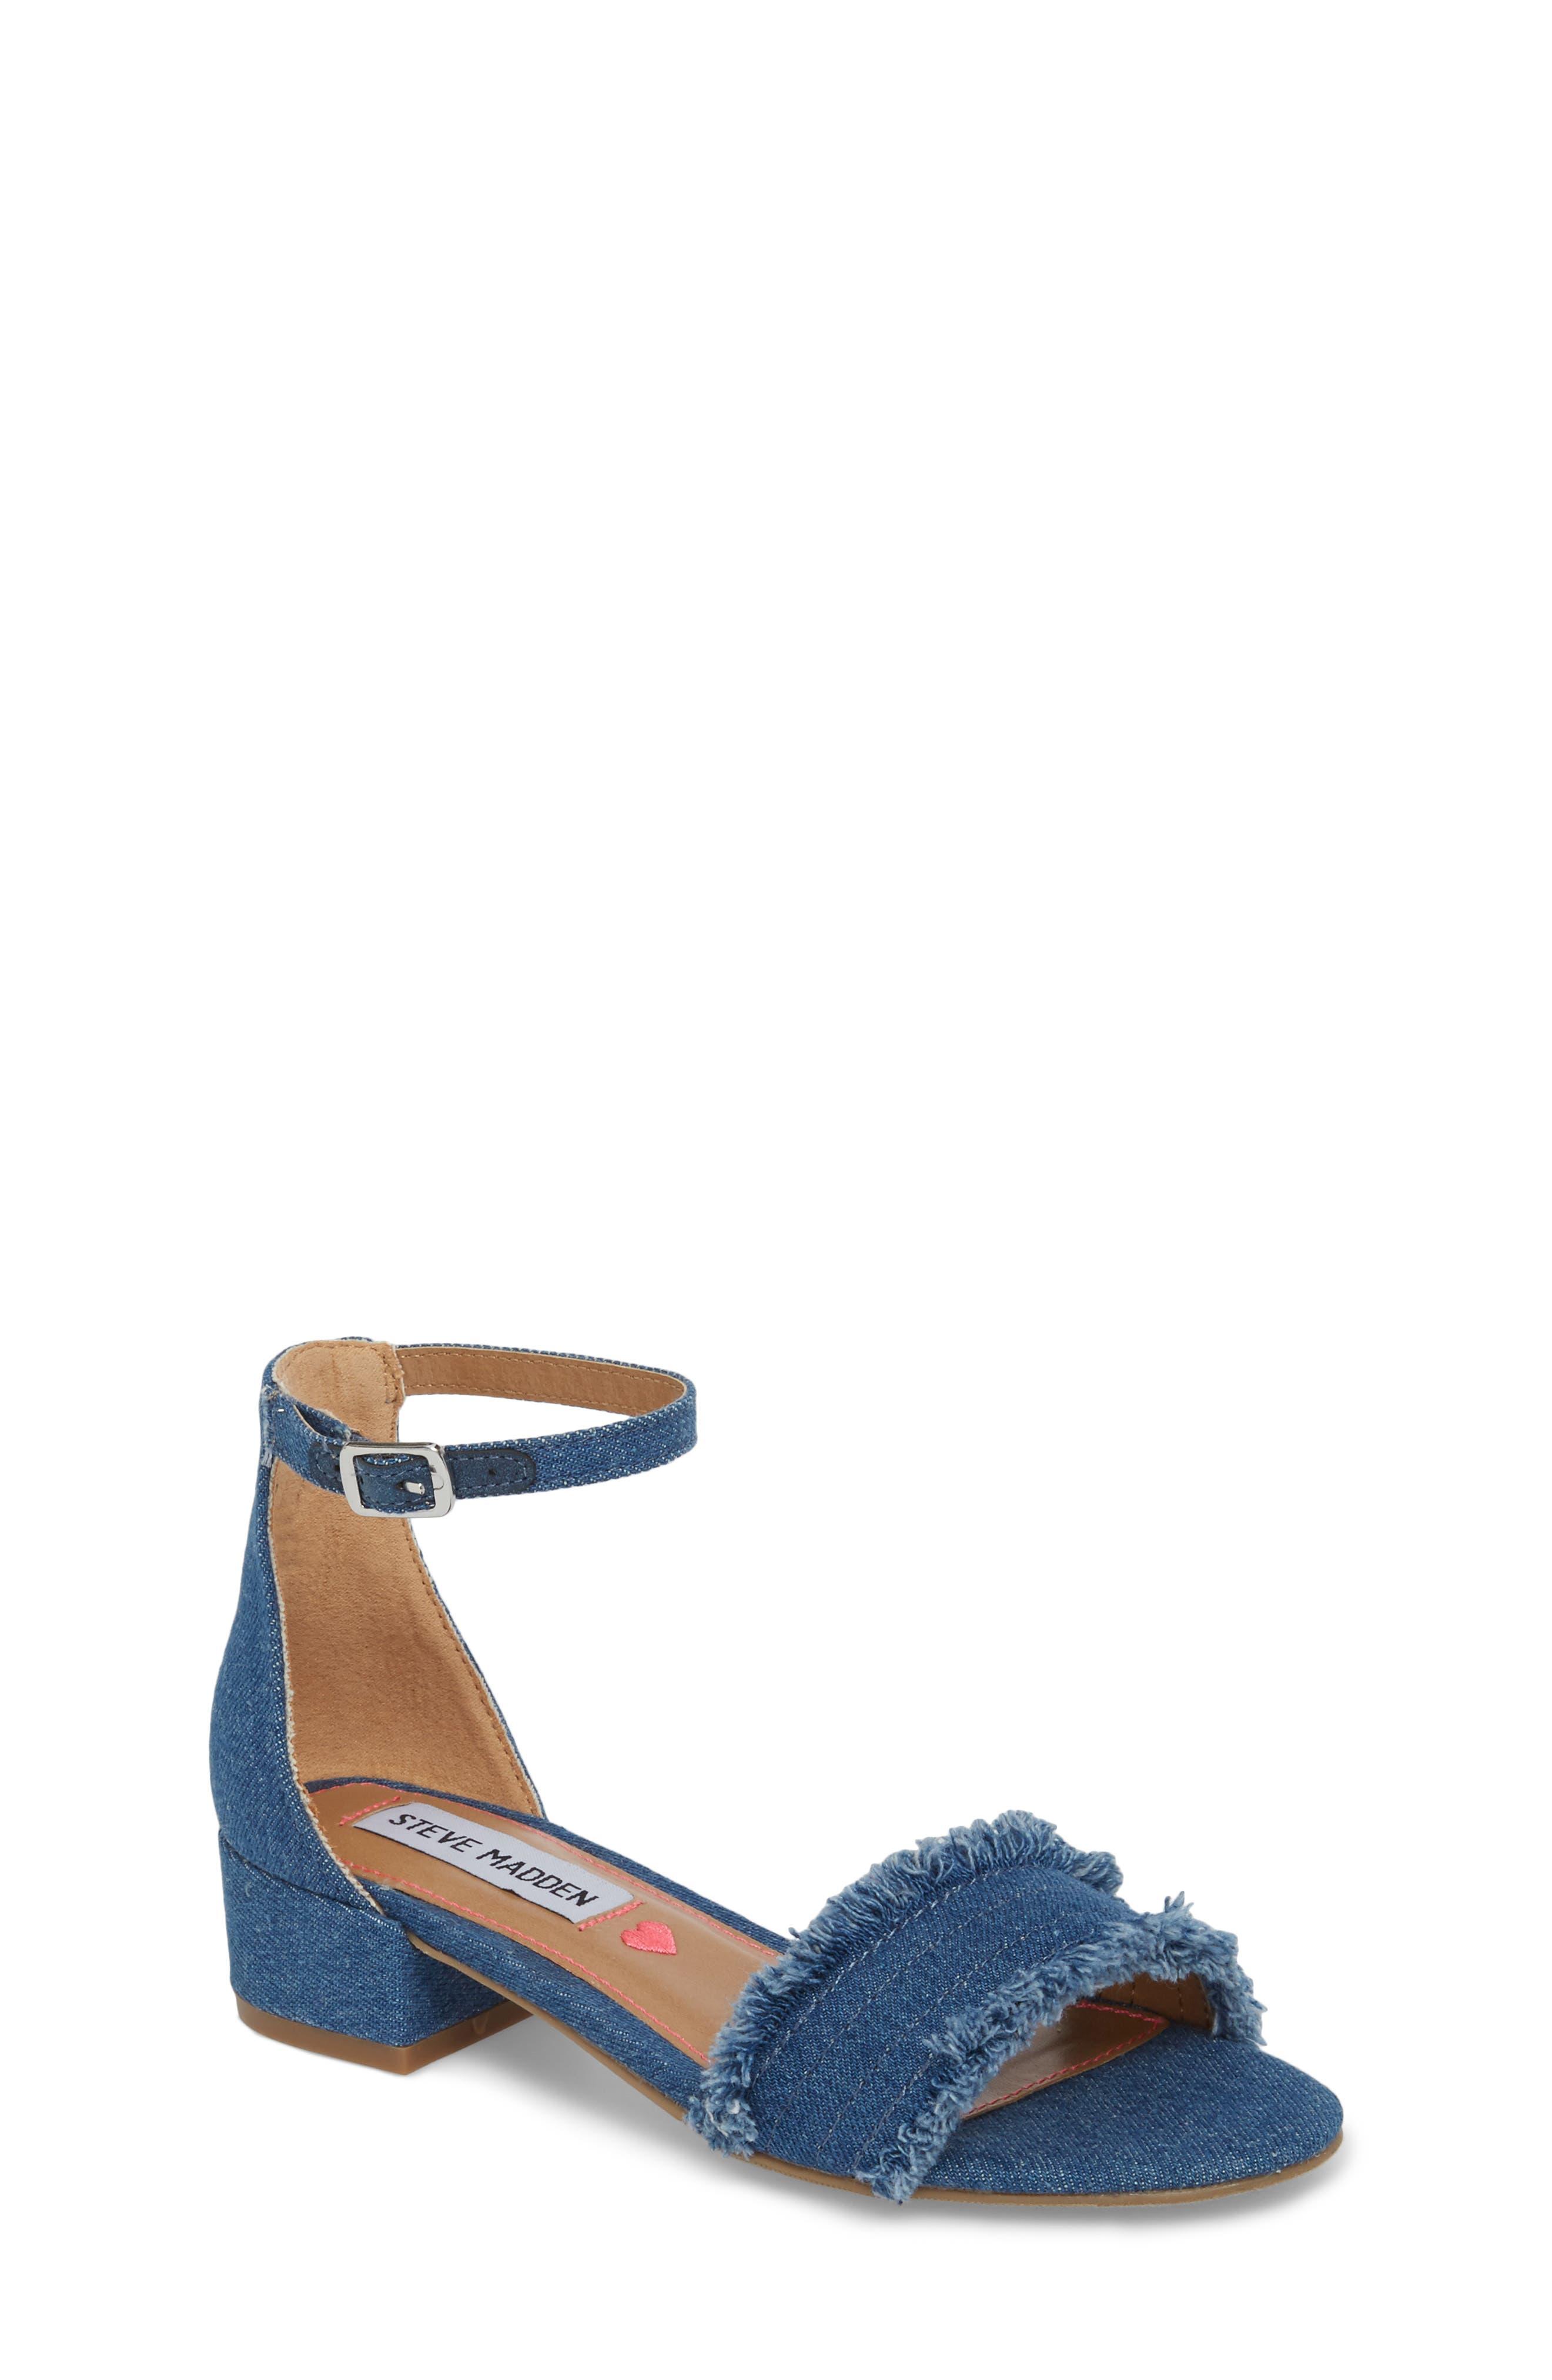 Jirene Metallic Sandal,                         Main,                         color, 401